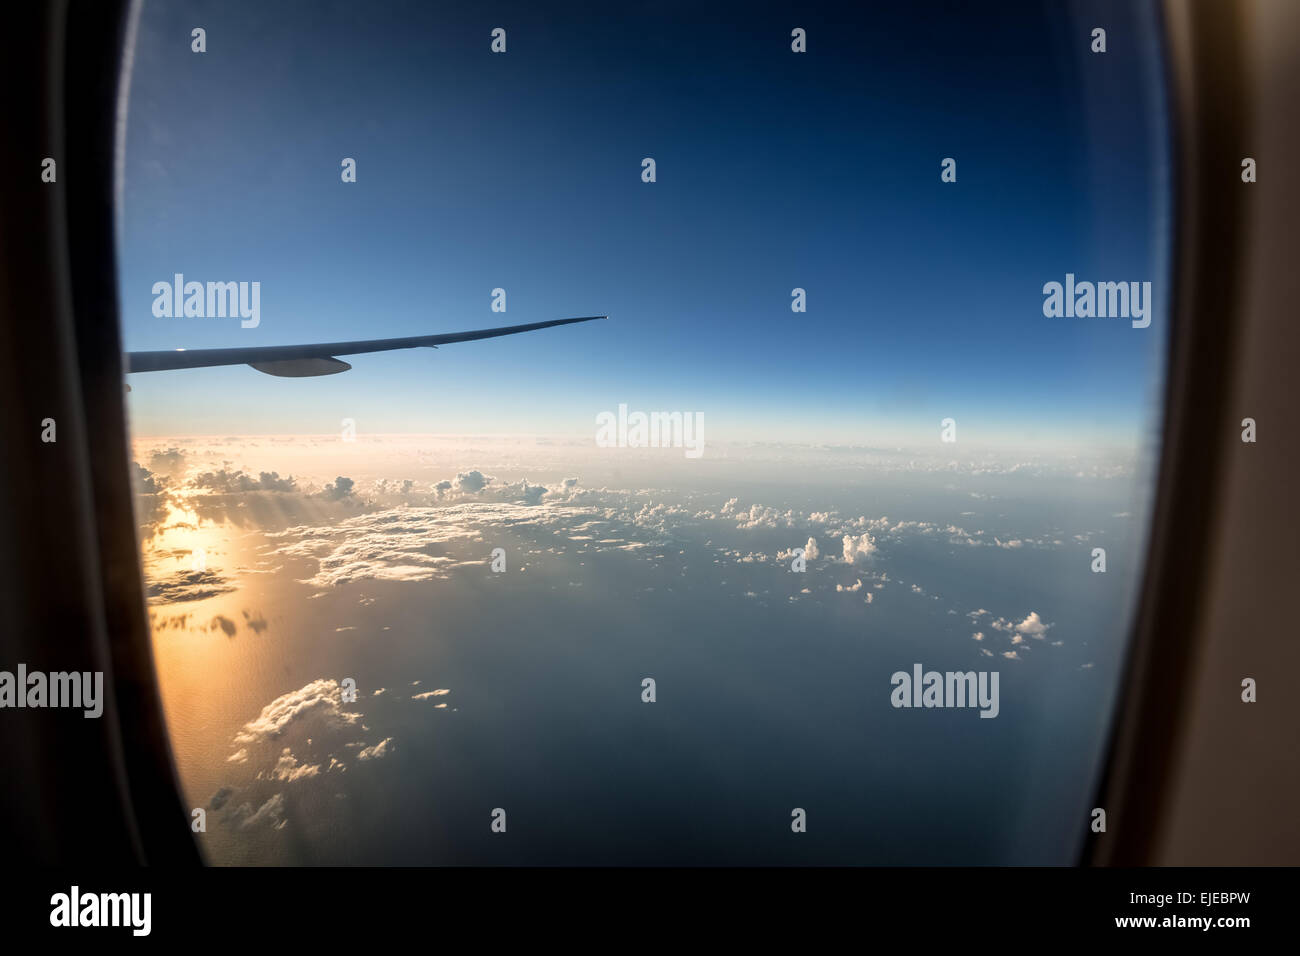 Sunrise over the North Atlantic Ocean - Stock Image